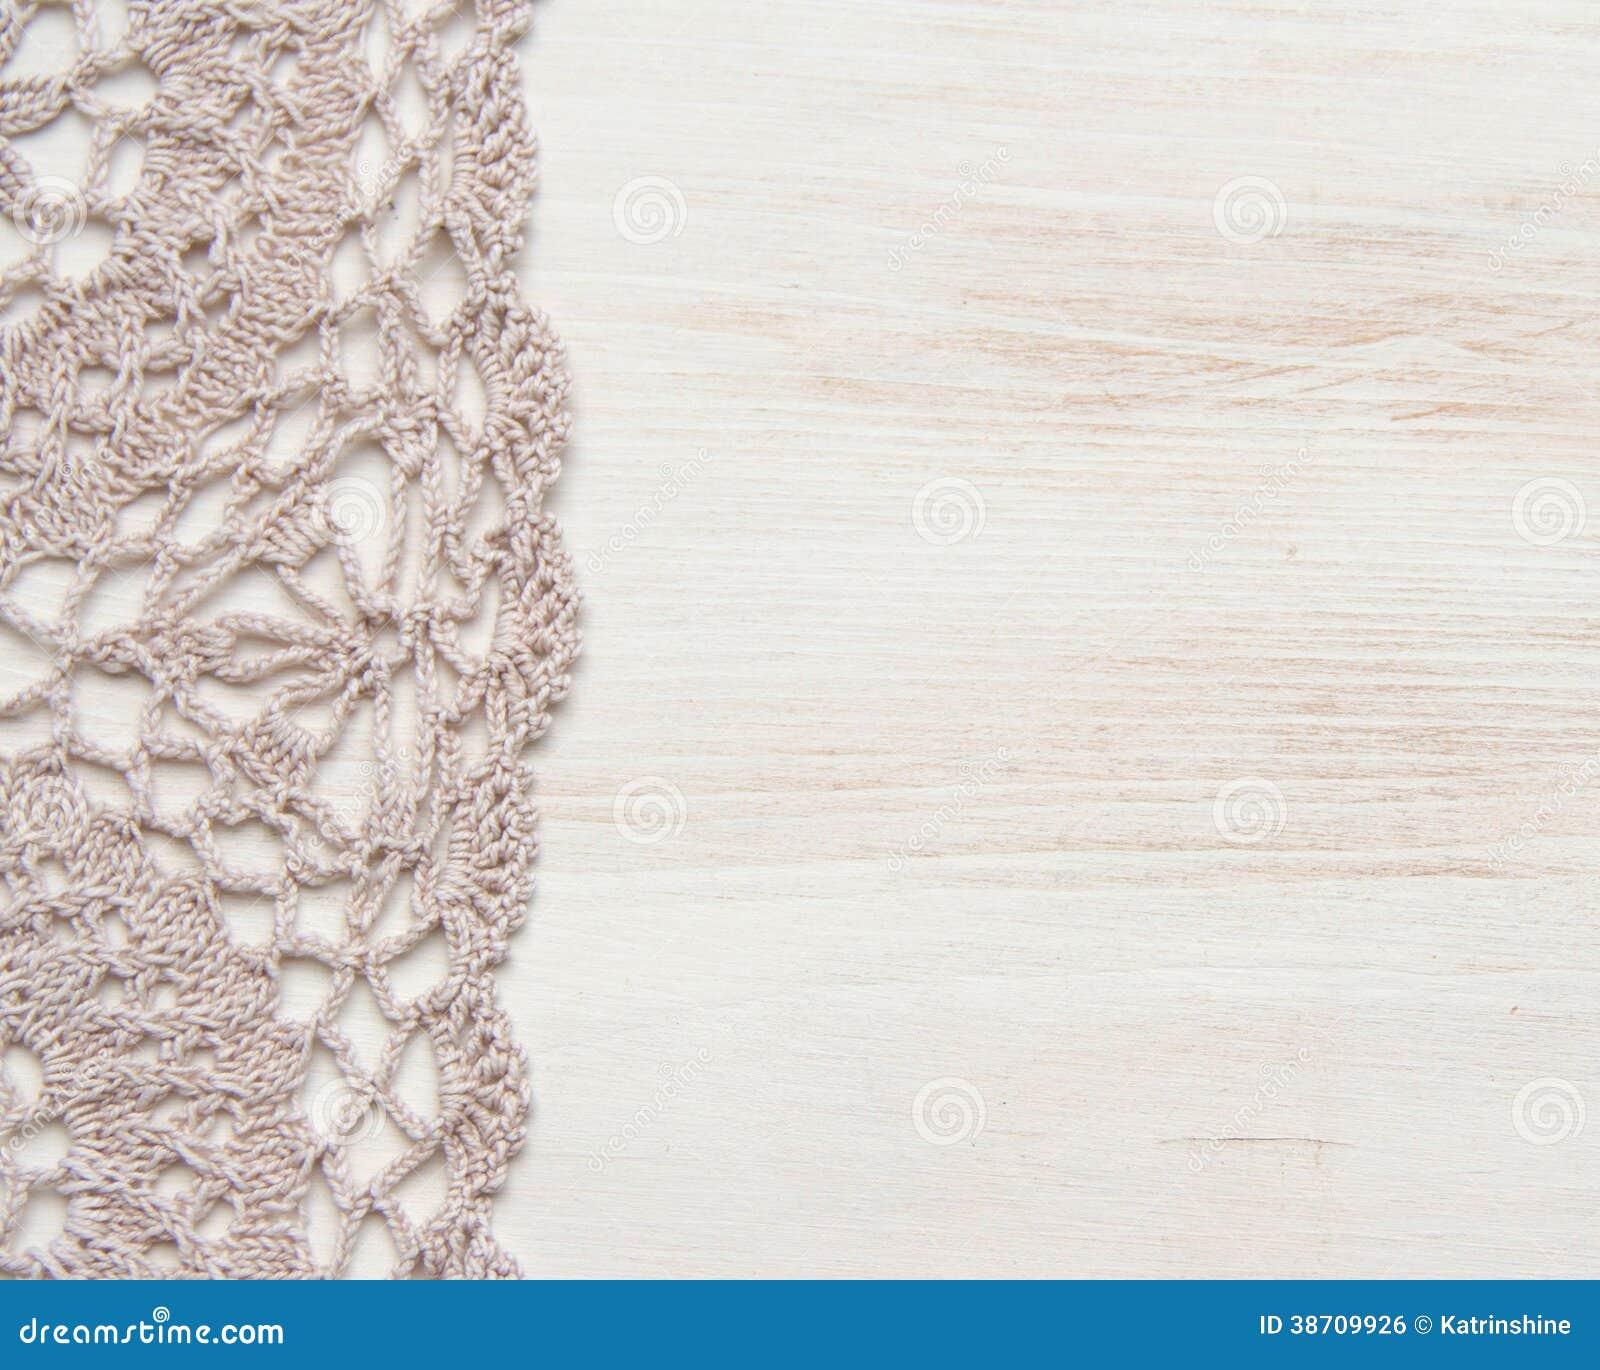 Crochet Doily Border Stock Photo Image Of Background